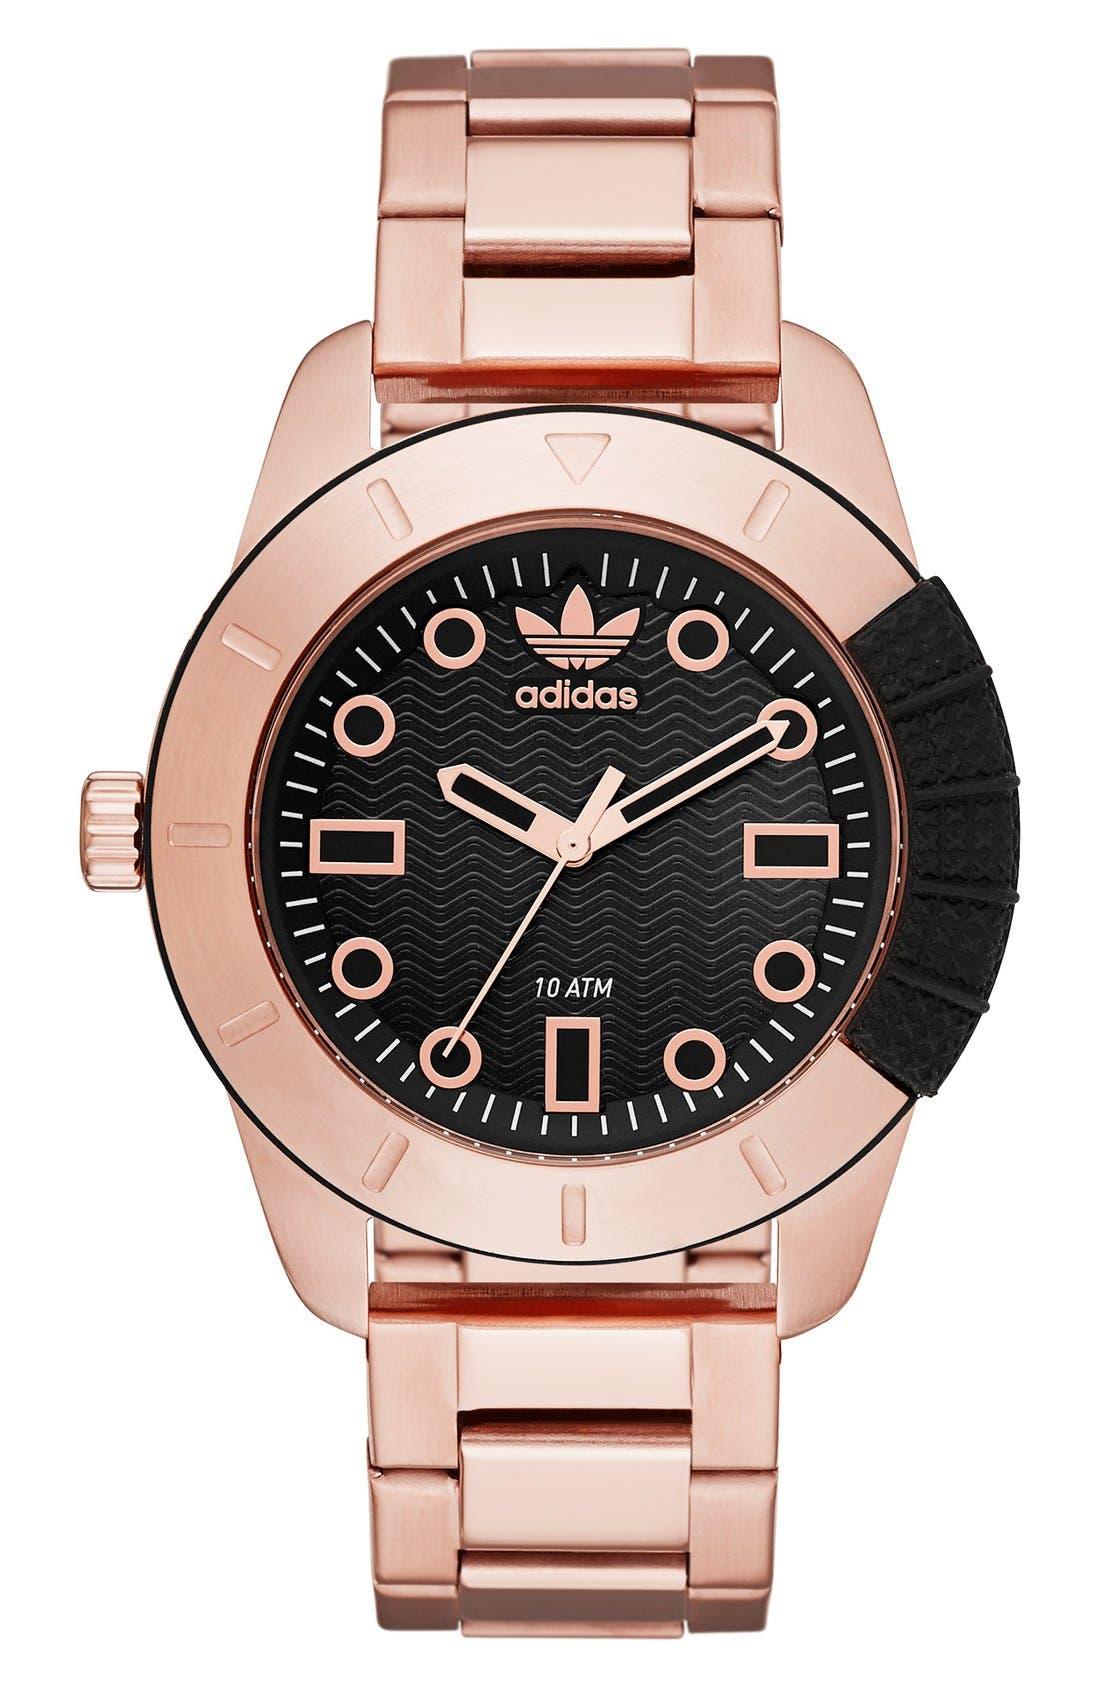 Main Image - adidasOriginals 'ADH-1969' Bracelet Watch, 42mm case